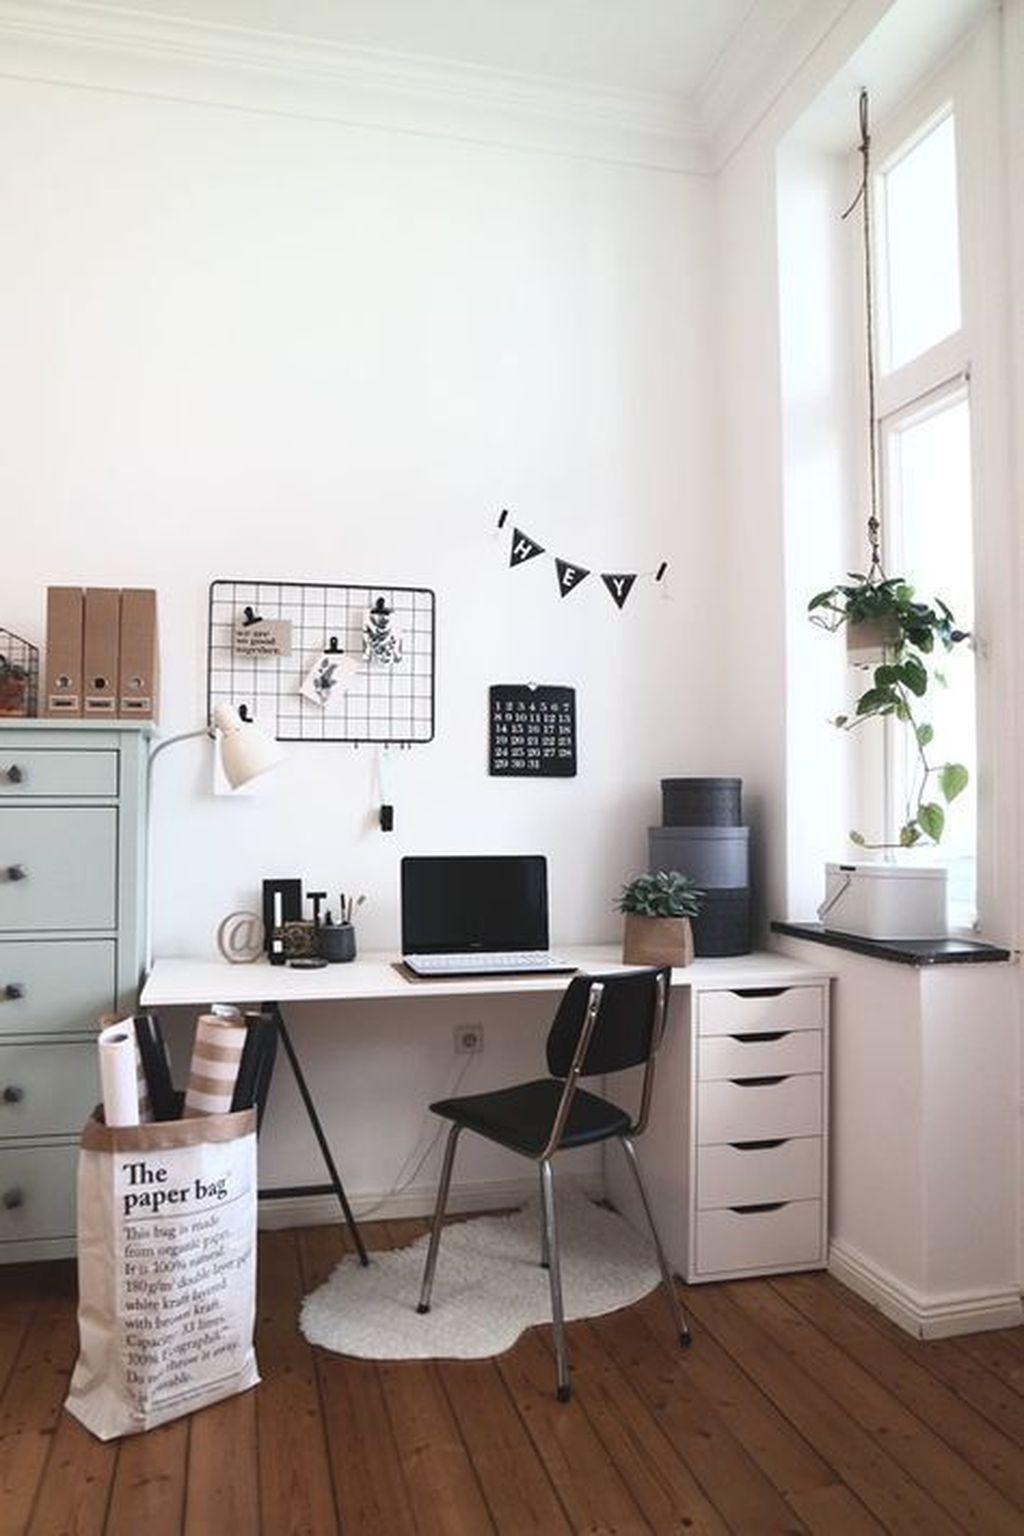 35 Elegant Scandinavian Interior Decorating Ideas For Small Spaces Cute Desk Decor Minimalist Living Room Home Office Design